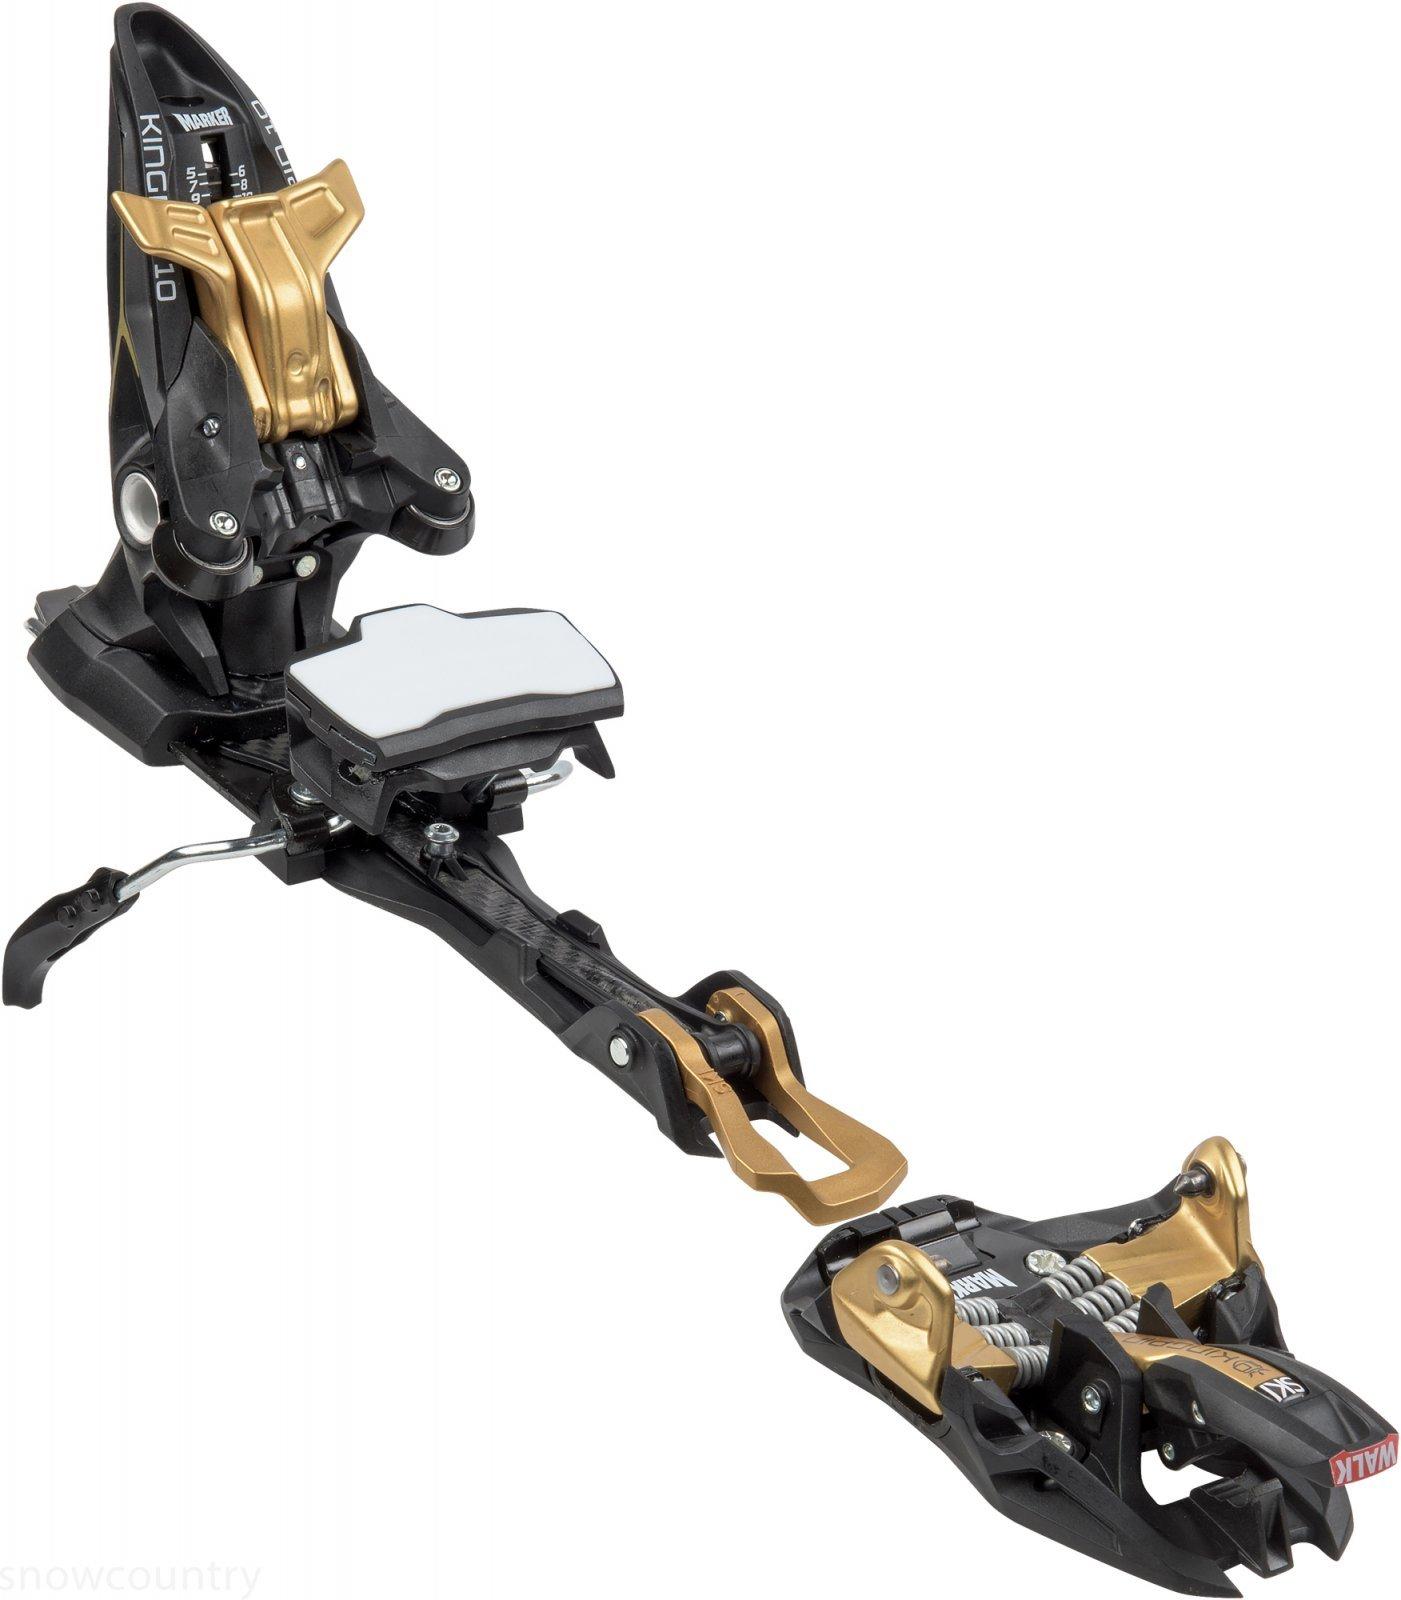 Marker Kingpin 13 Ski Bindings 18/19 100-125mm